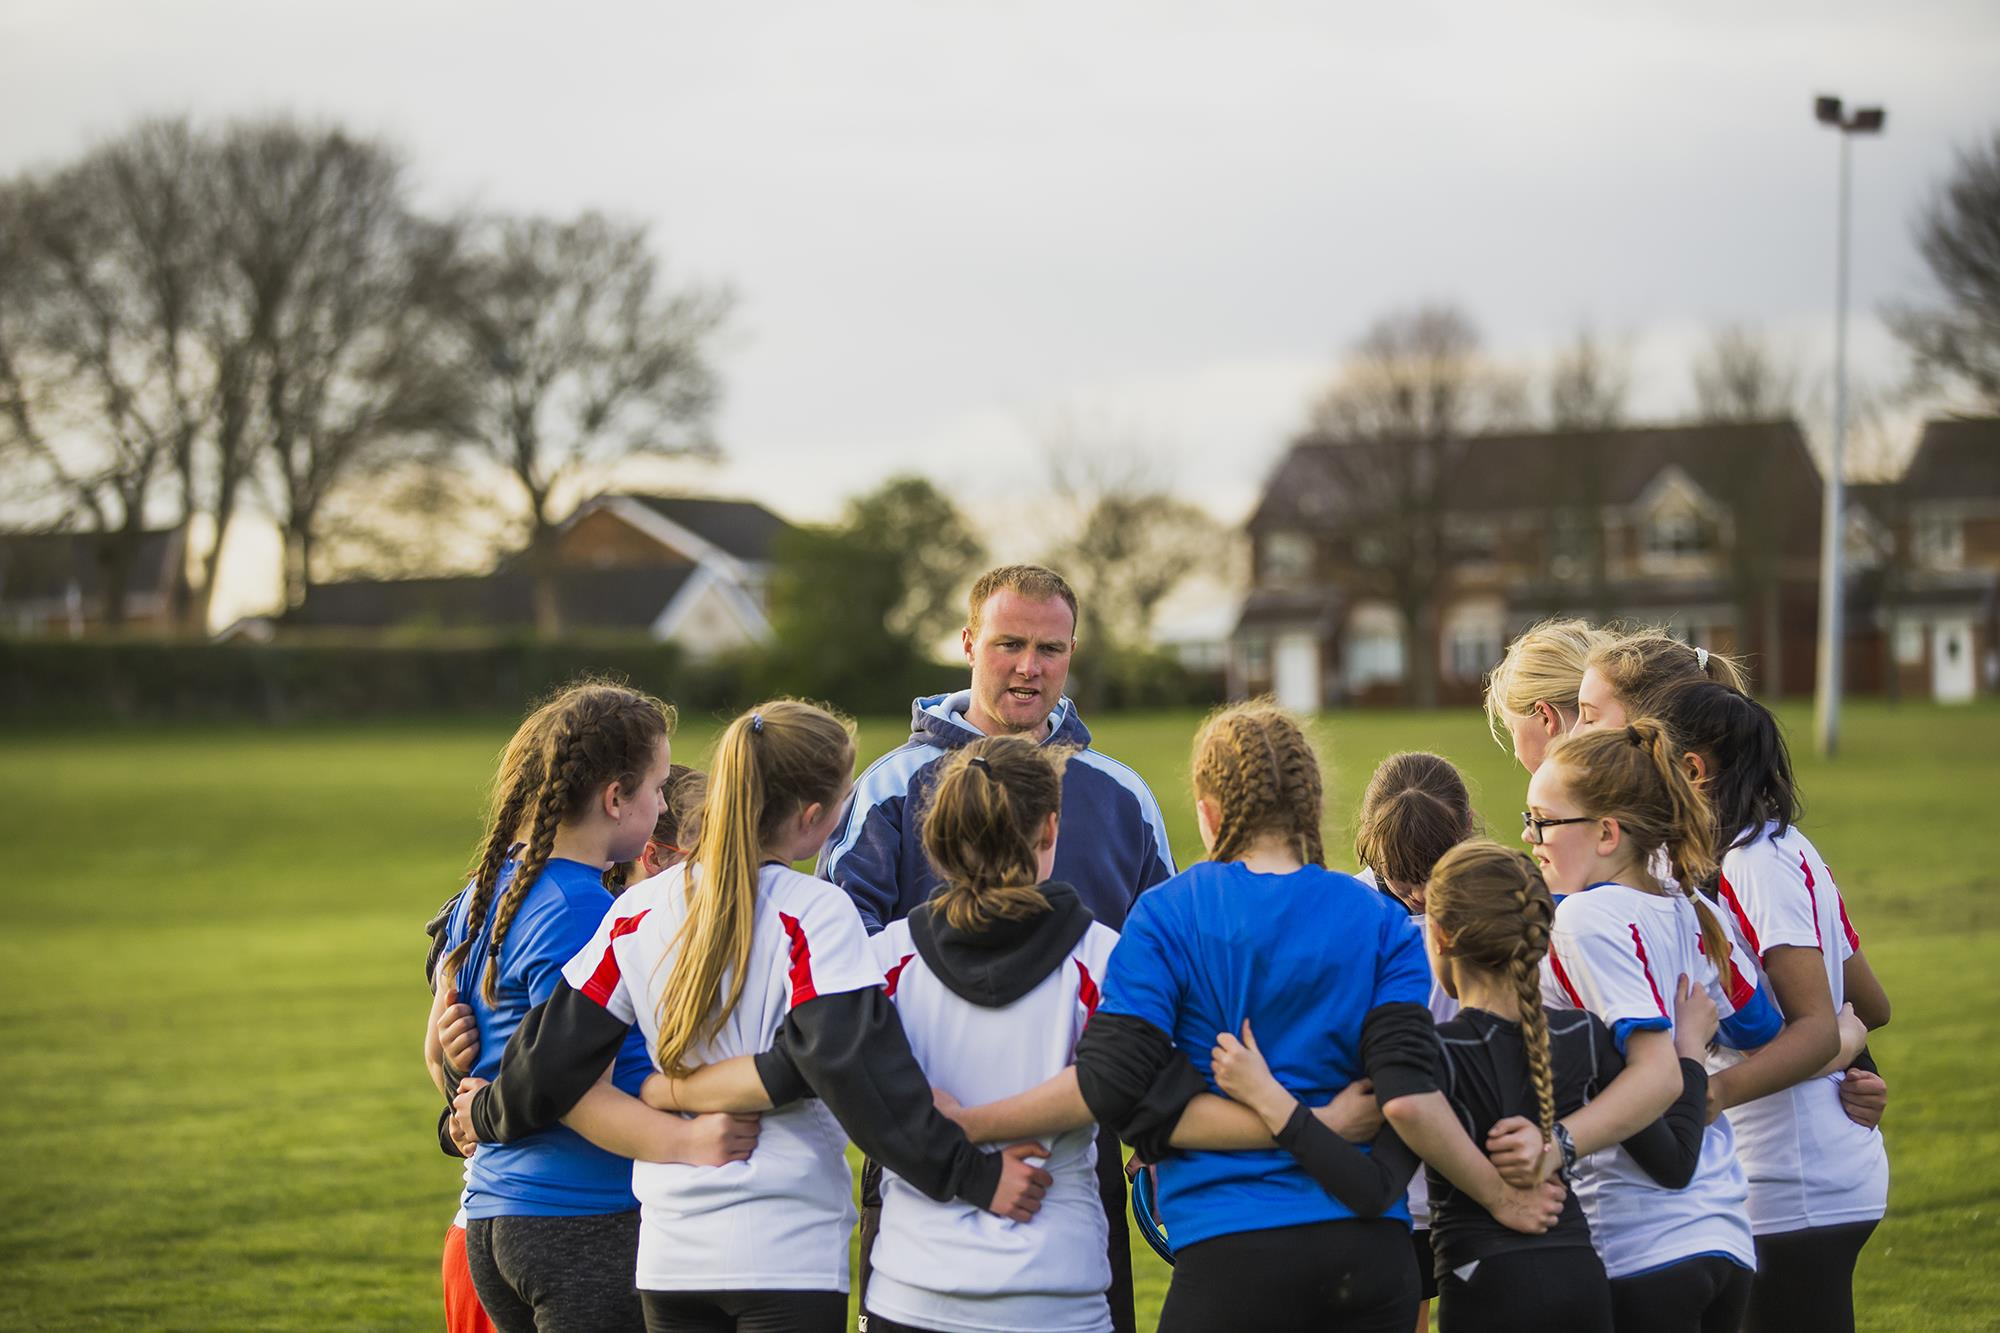 Grassroots Sport Girls in field ()